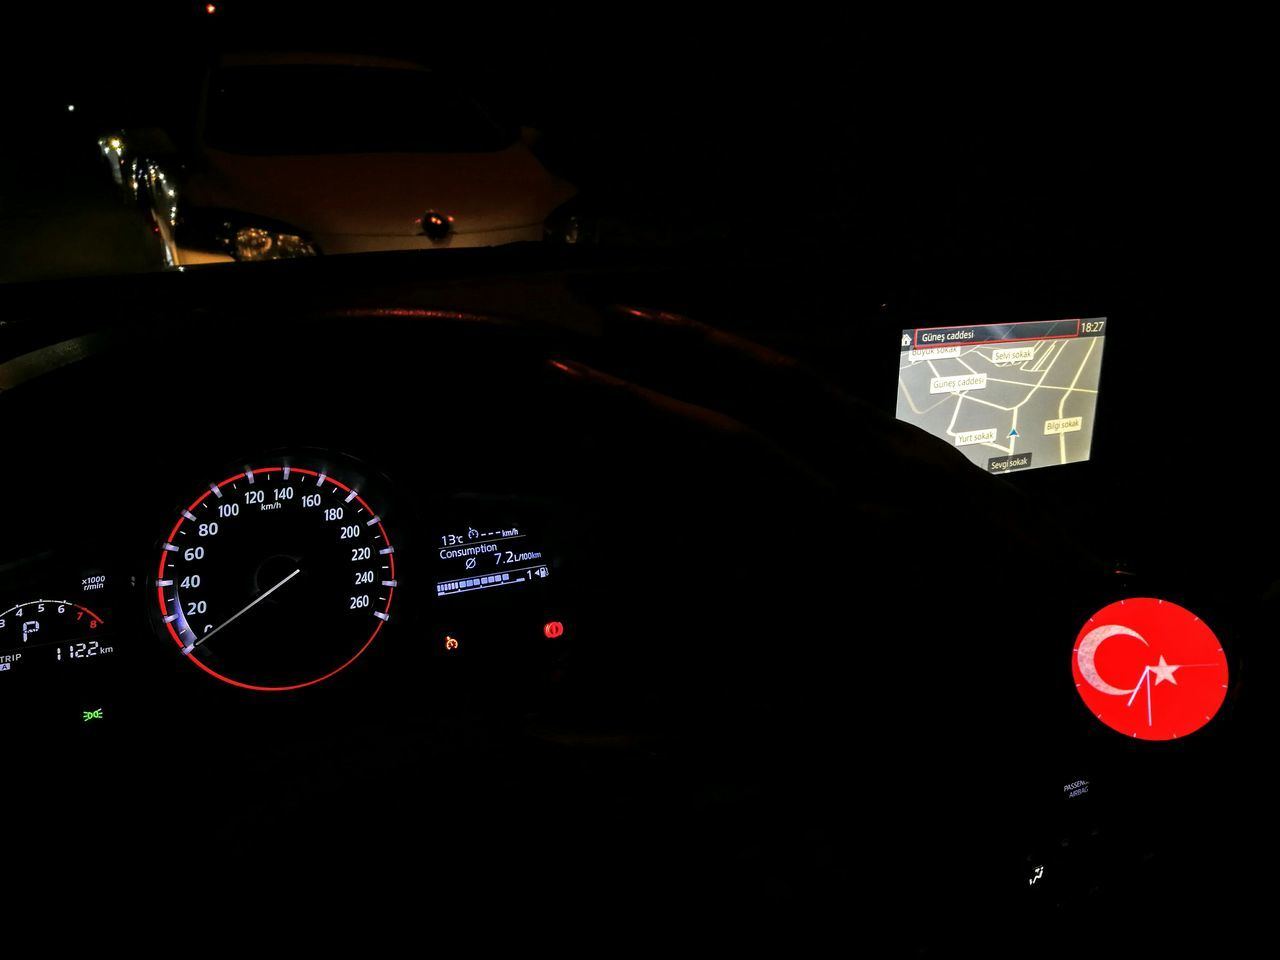 Illuminated Dark Control Panel Night Close-up Mazda Mazdaspeed3  MaZda3 HuaweiP9 HuaweiWatch